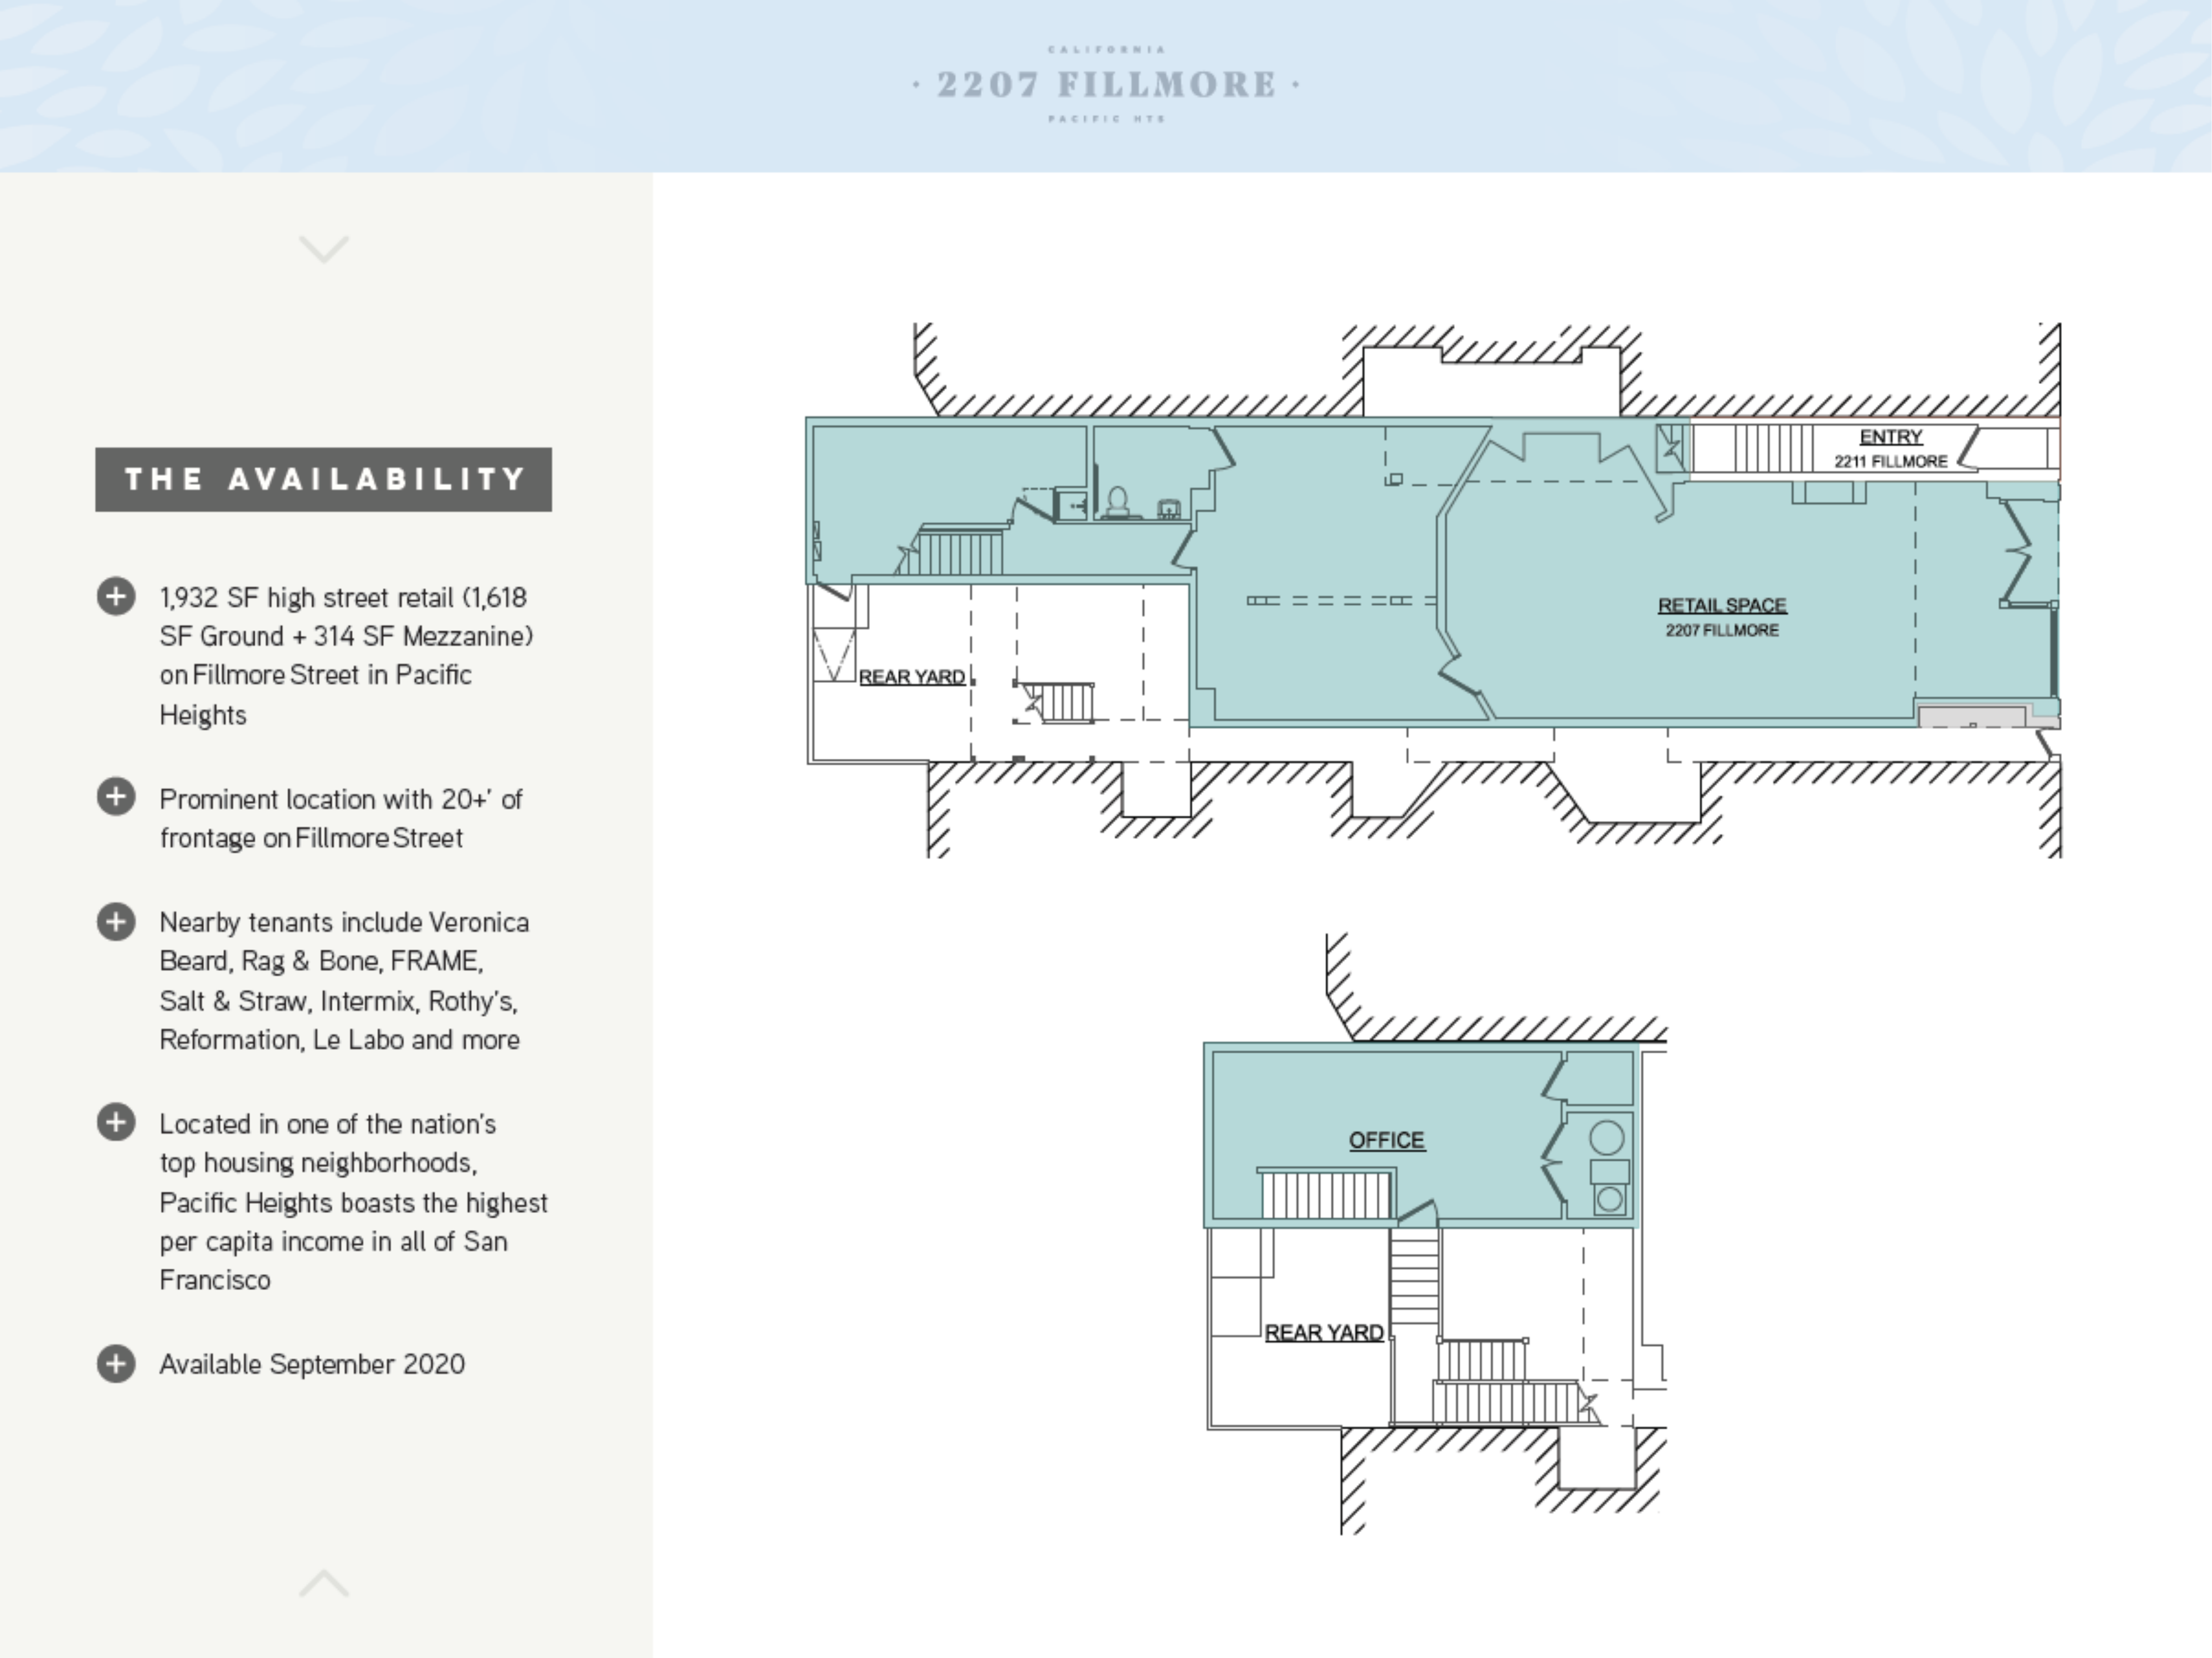 2207 Fillmore Street: site plan